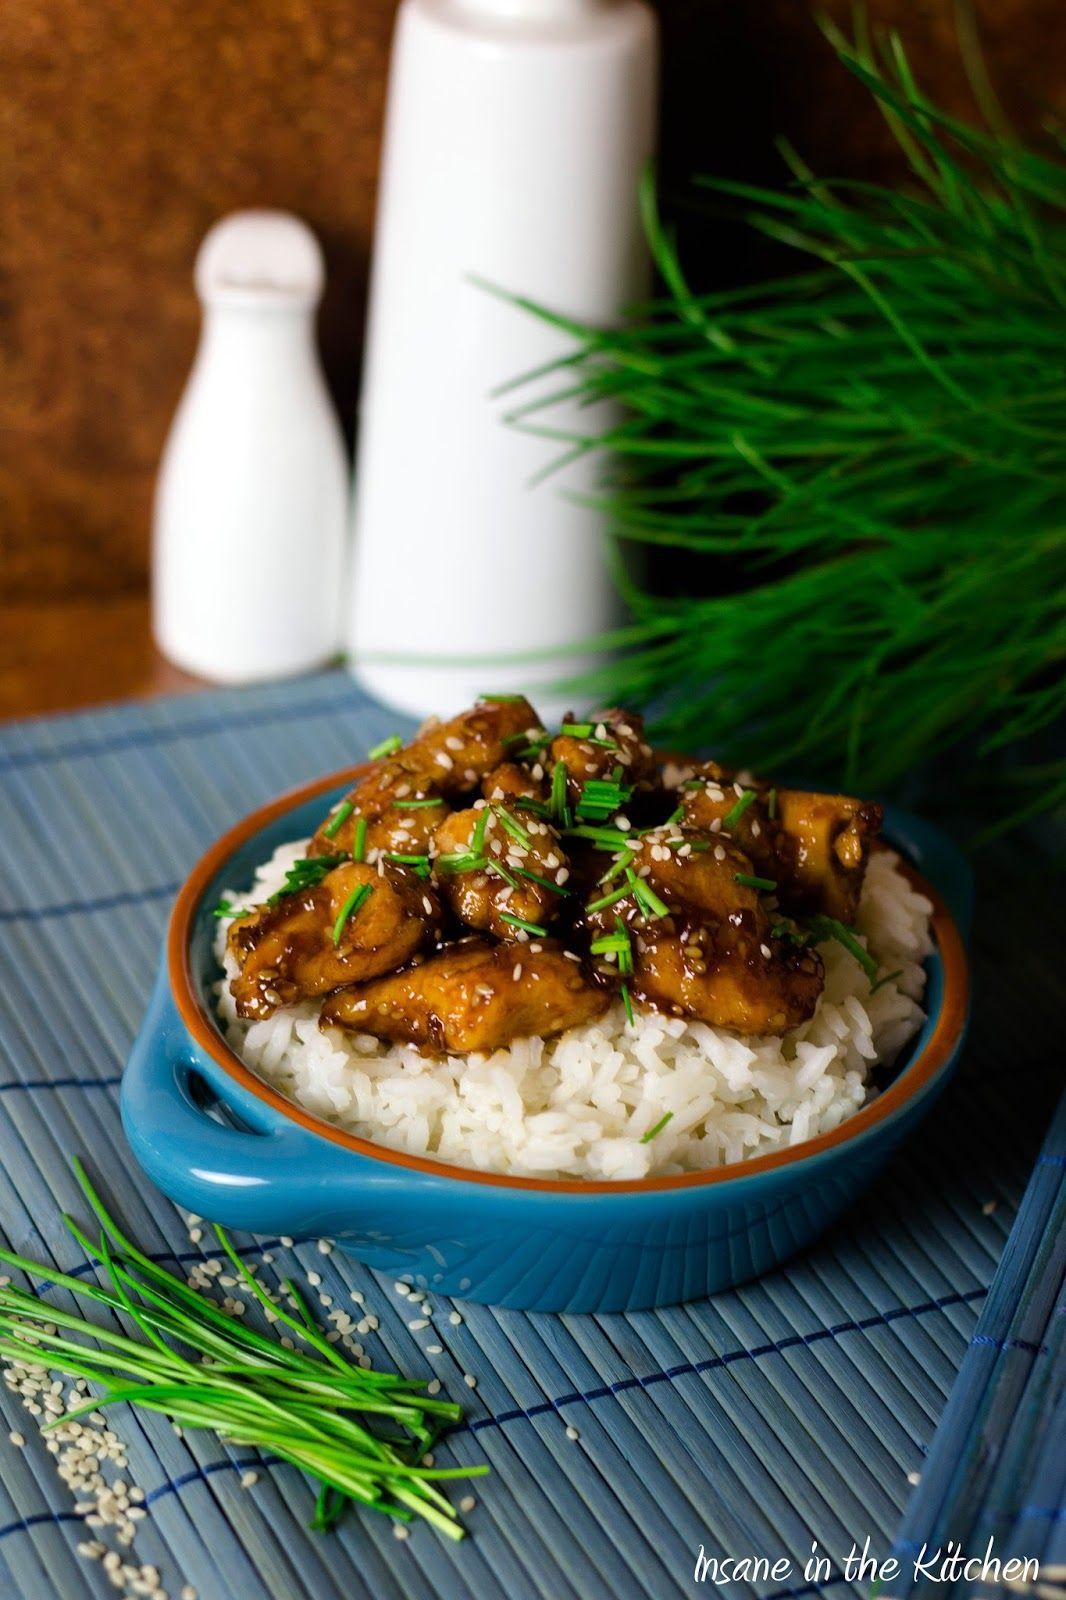 Honig-Sesam-Hühnchen -   25 fitness food rezepte ideas